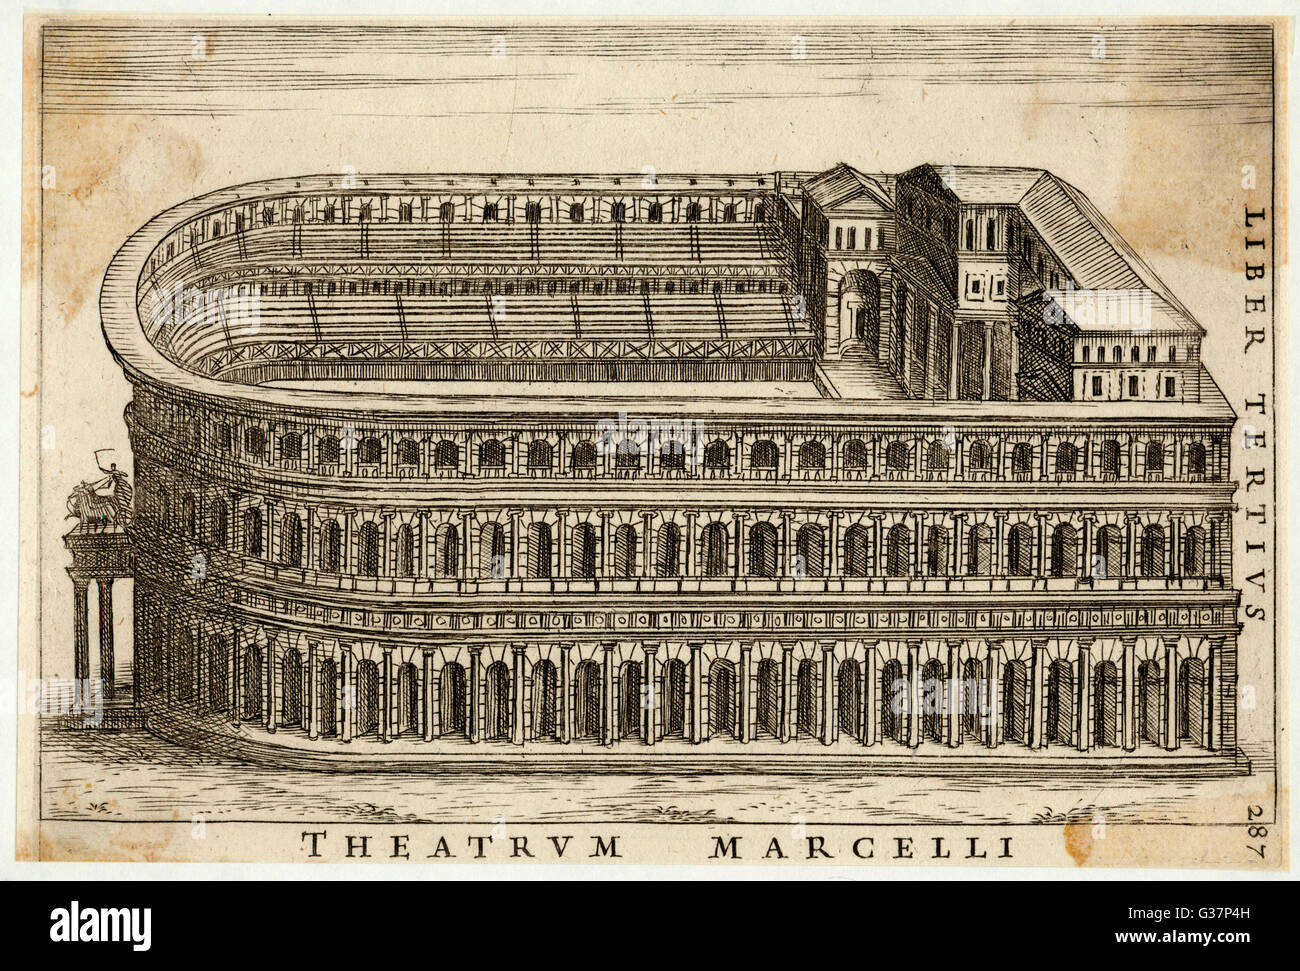 Rekonstruktion des Theaters der Marcellus.     Datum: 1665 Stockbild